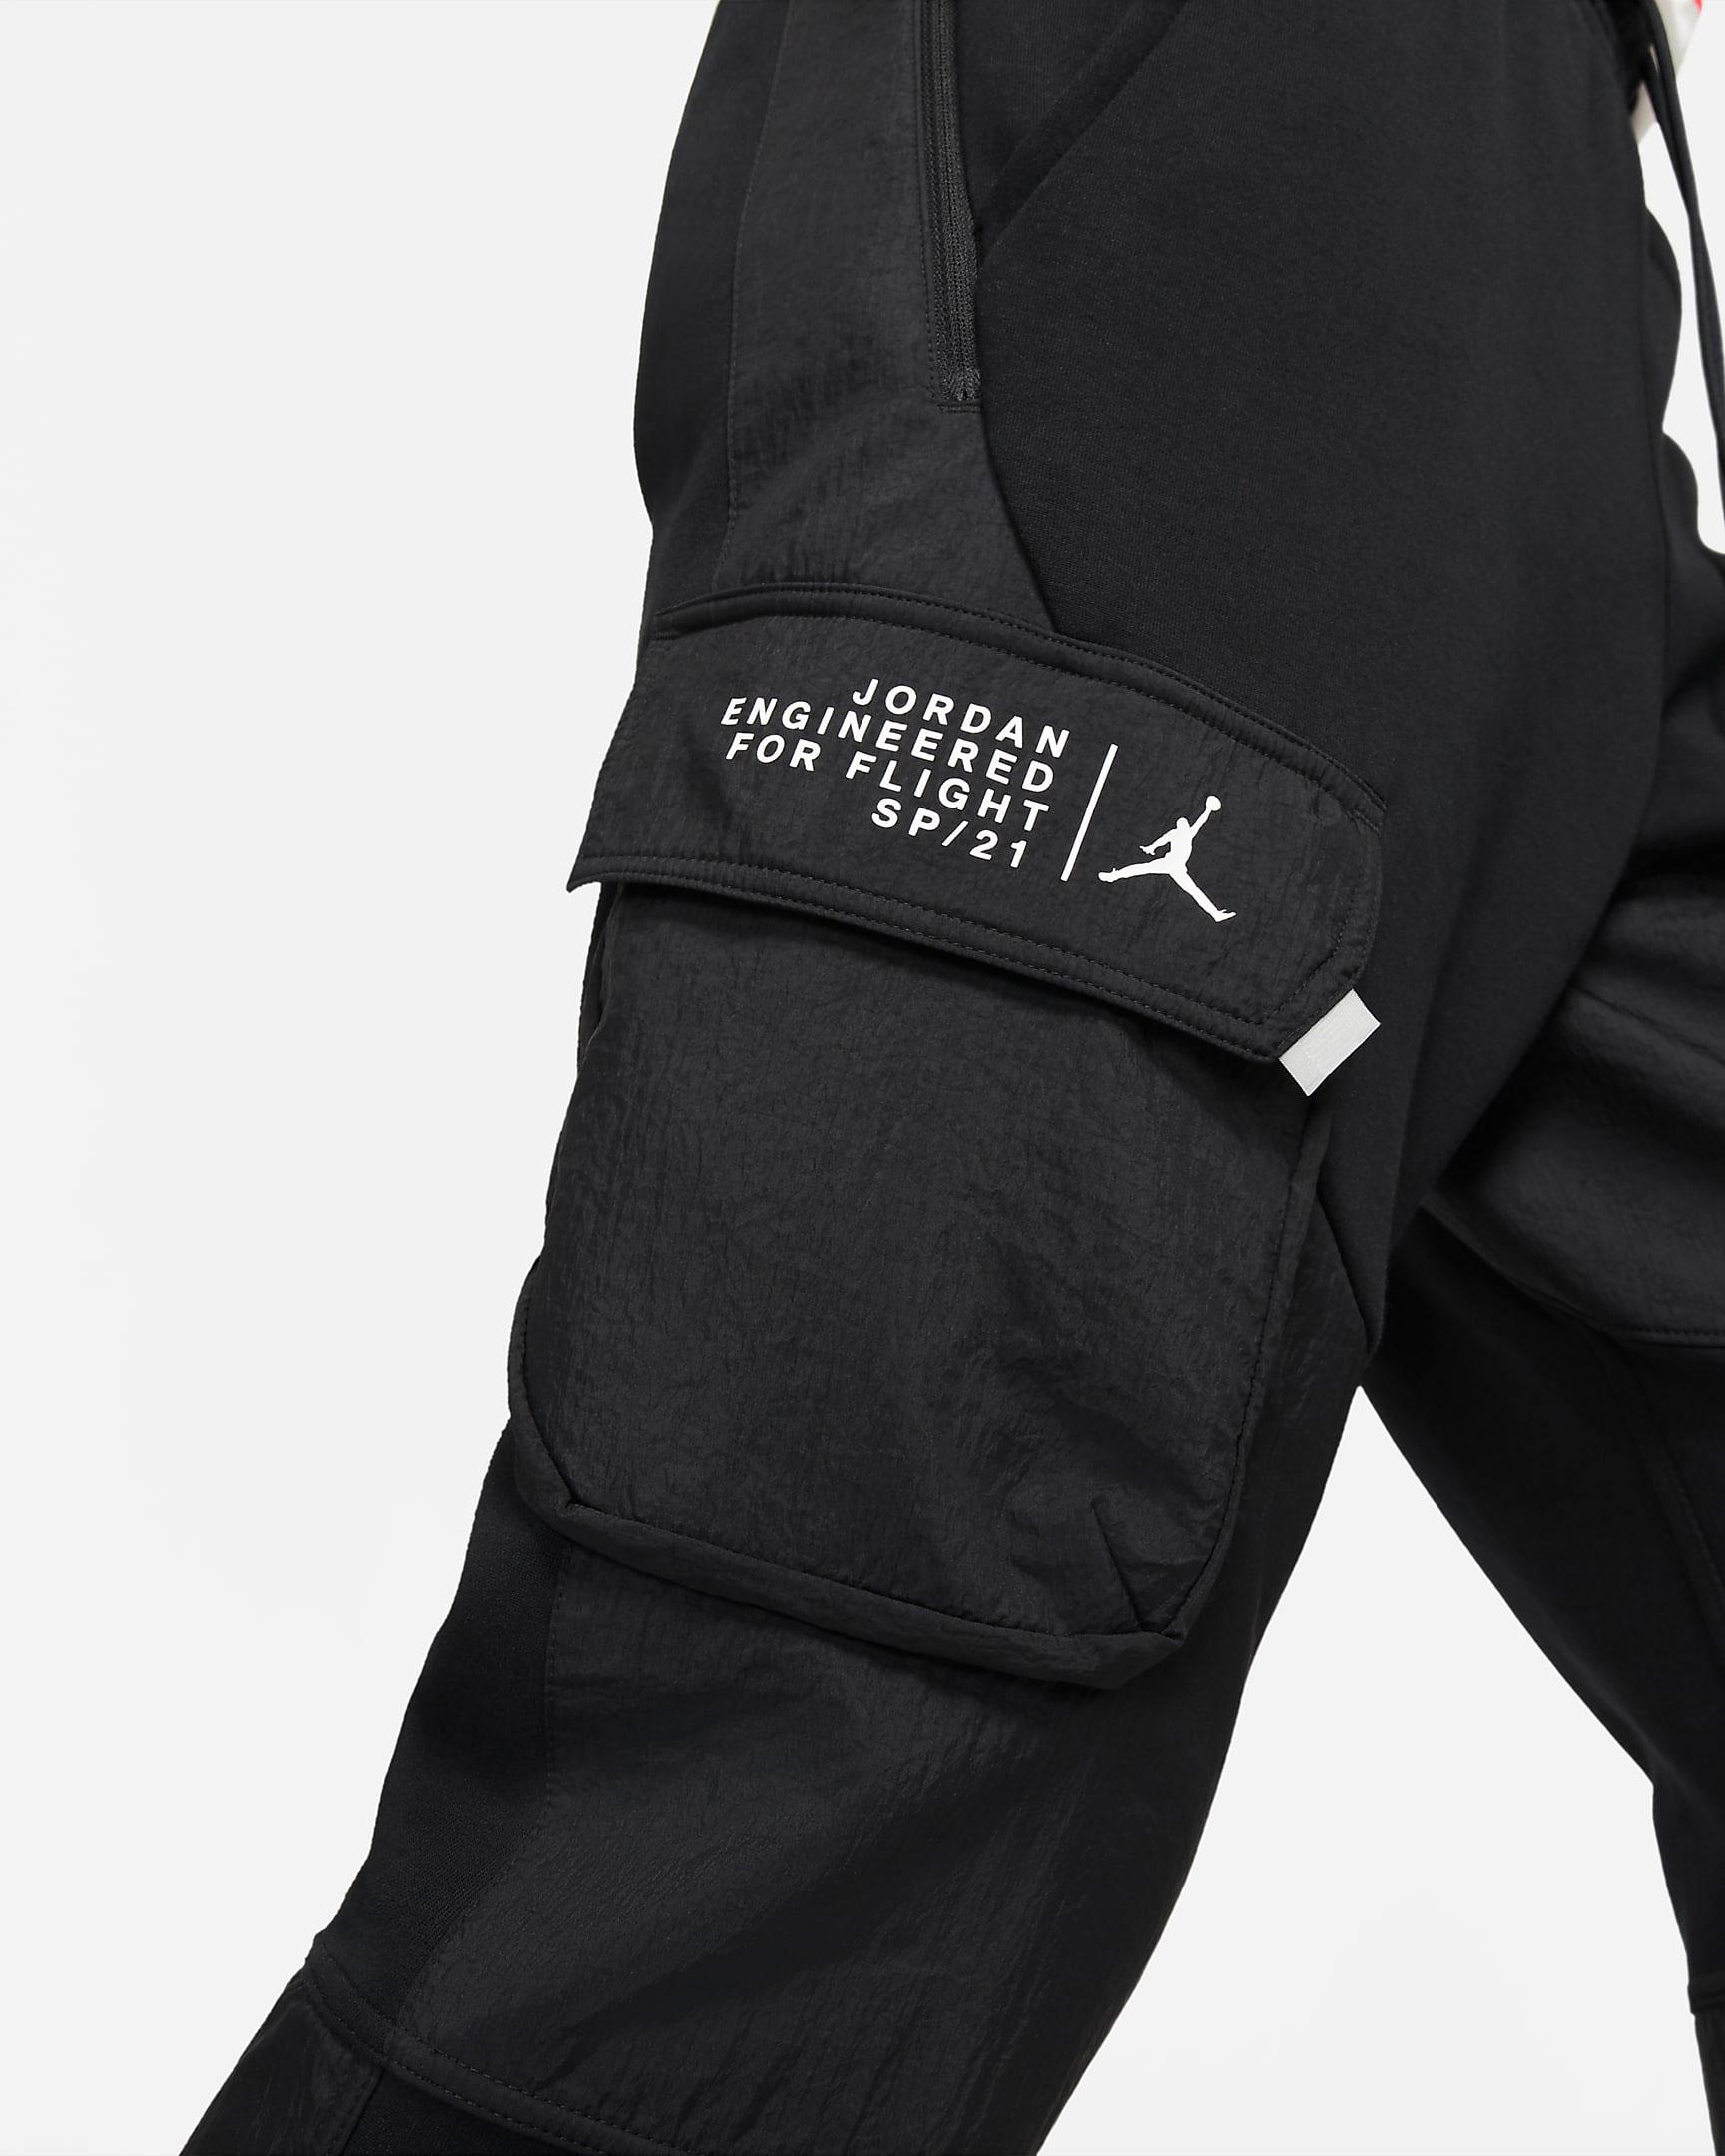 jordan-23-engineered-fleece-cargo-pants-black-white-3